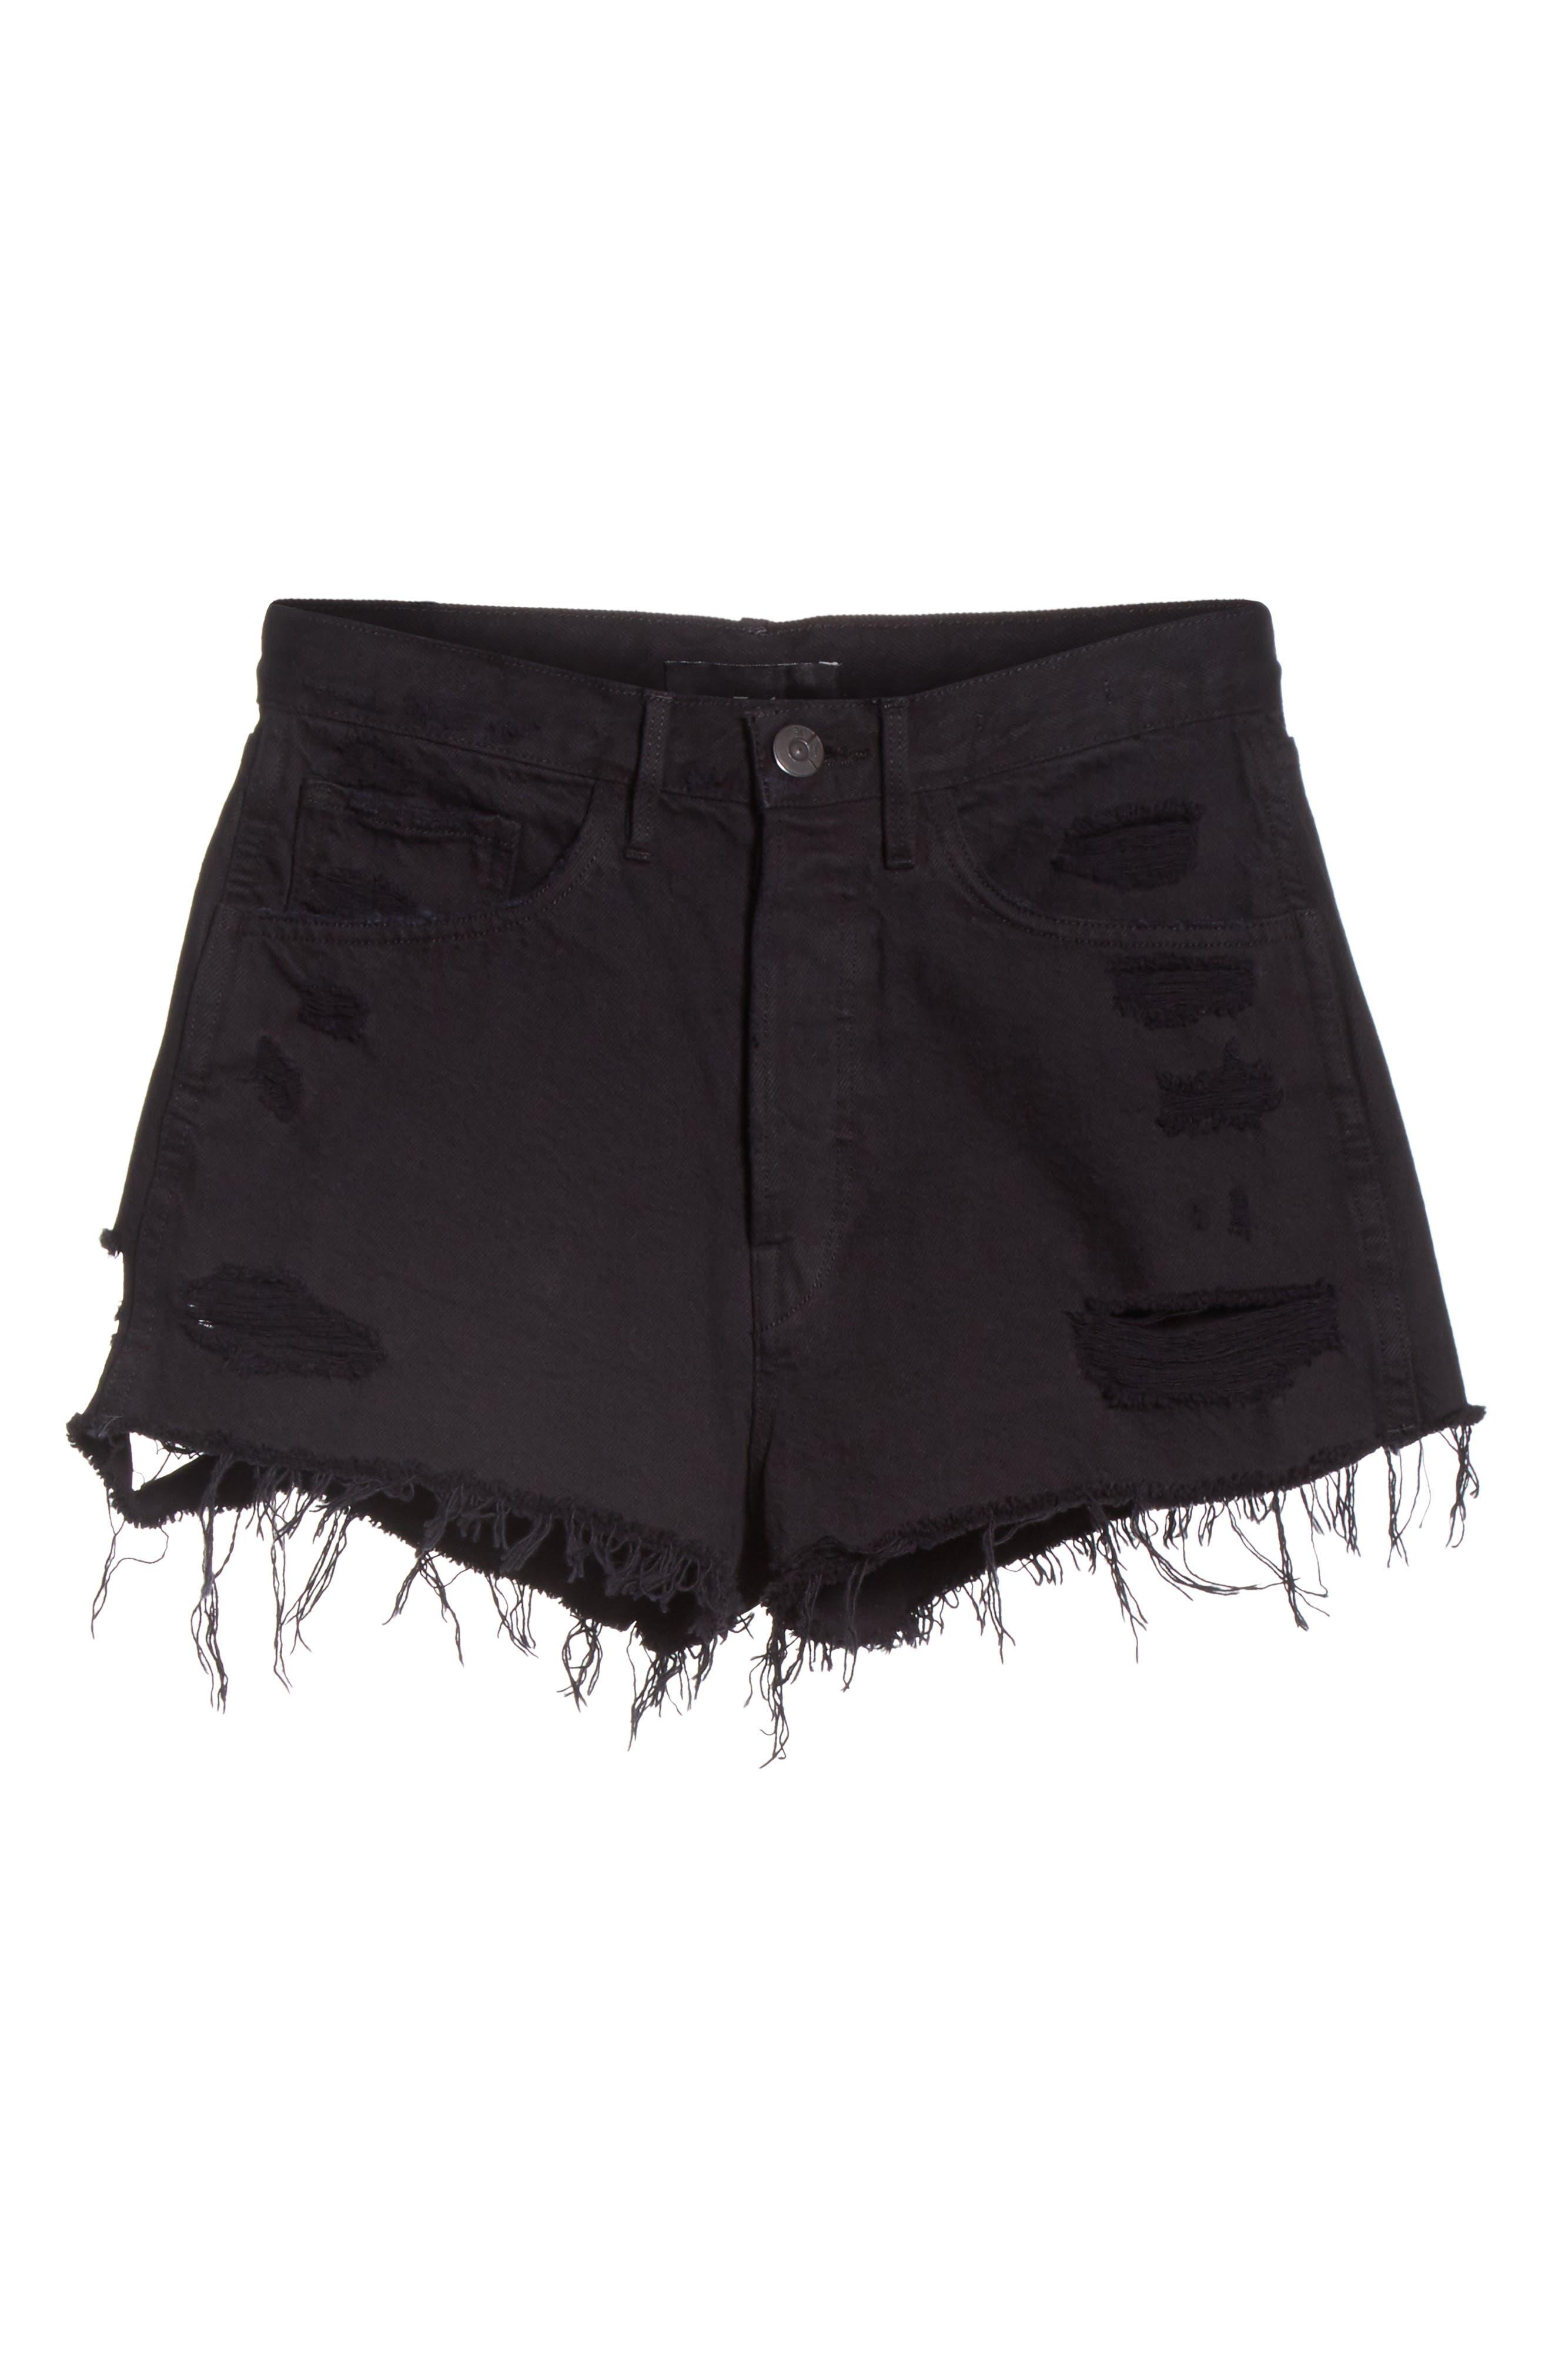 W4 Carter Ripped High Waist Denim Shorts,                             Alternate thumbnail 6, color,                             Carbon